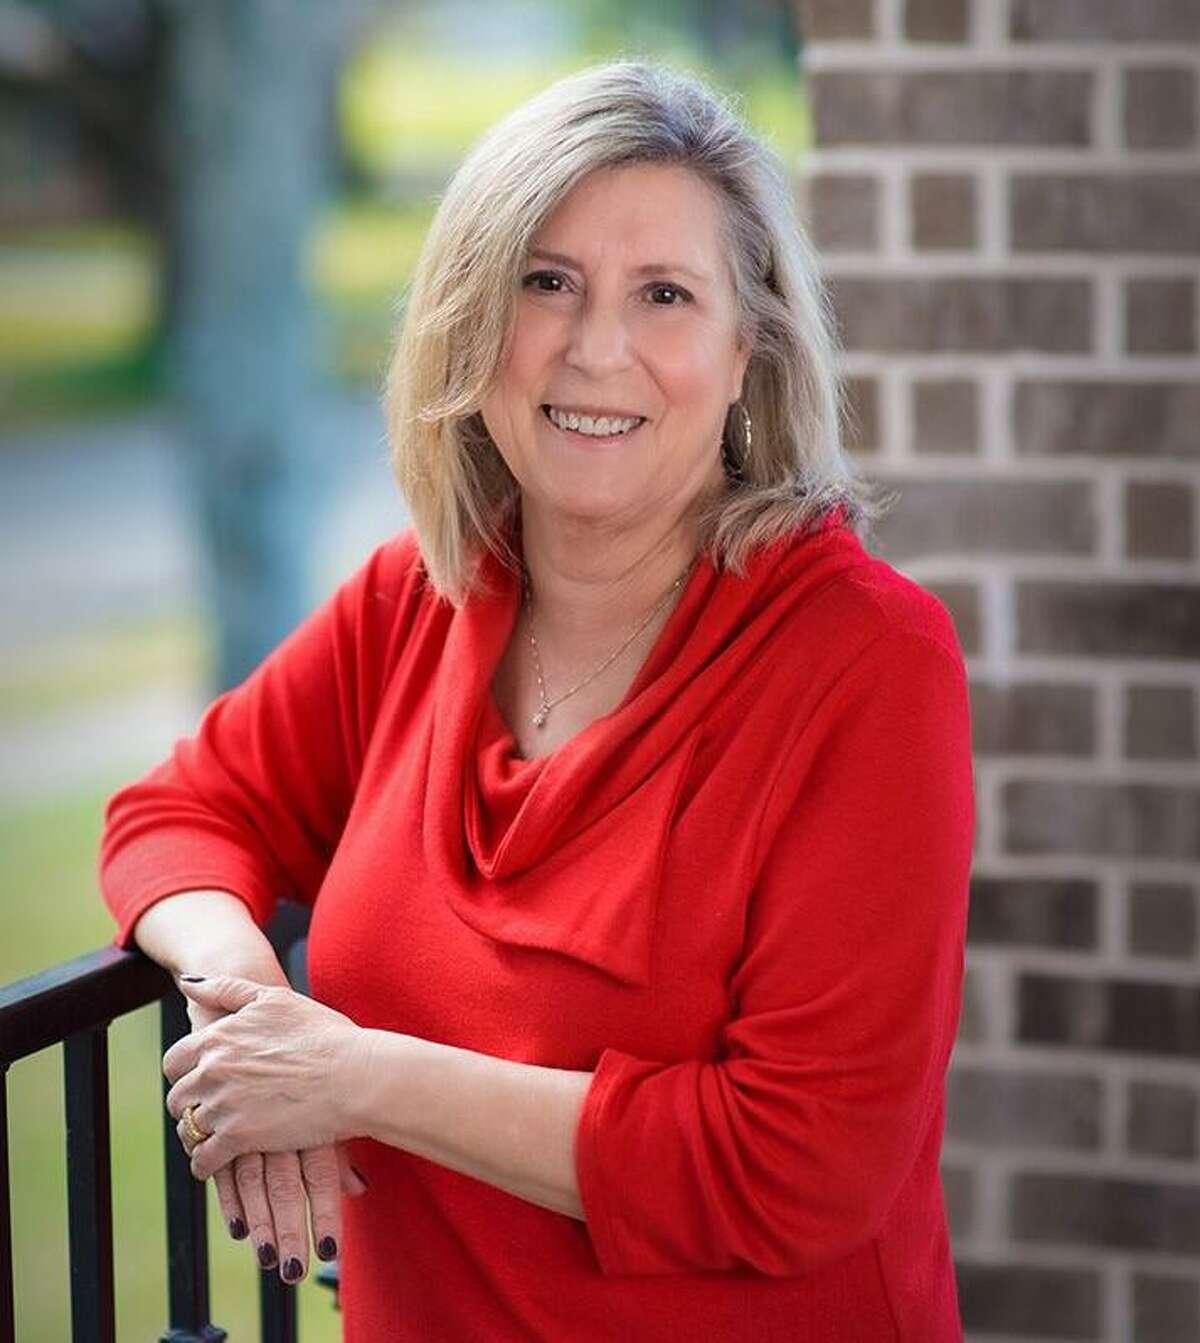 Ellen Leventhal taught at The Shlenker School and has written multiple books